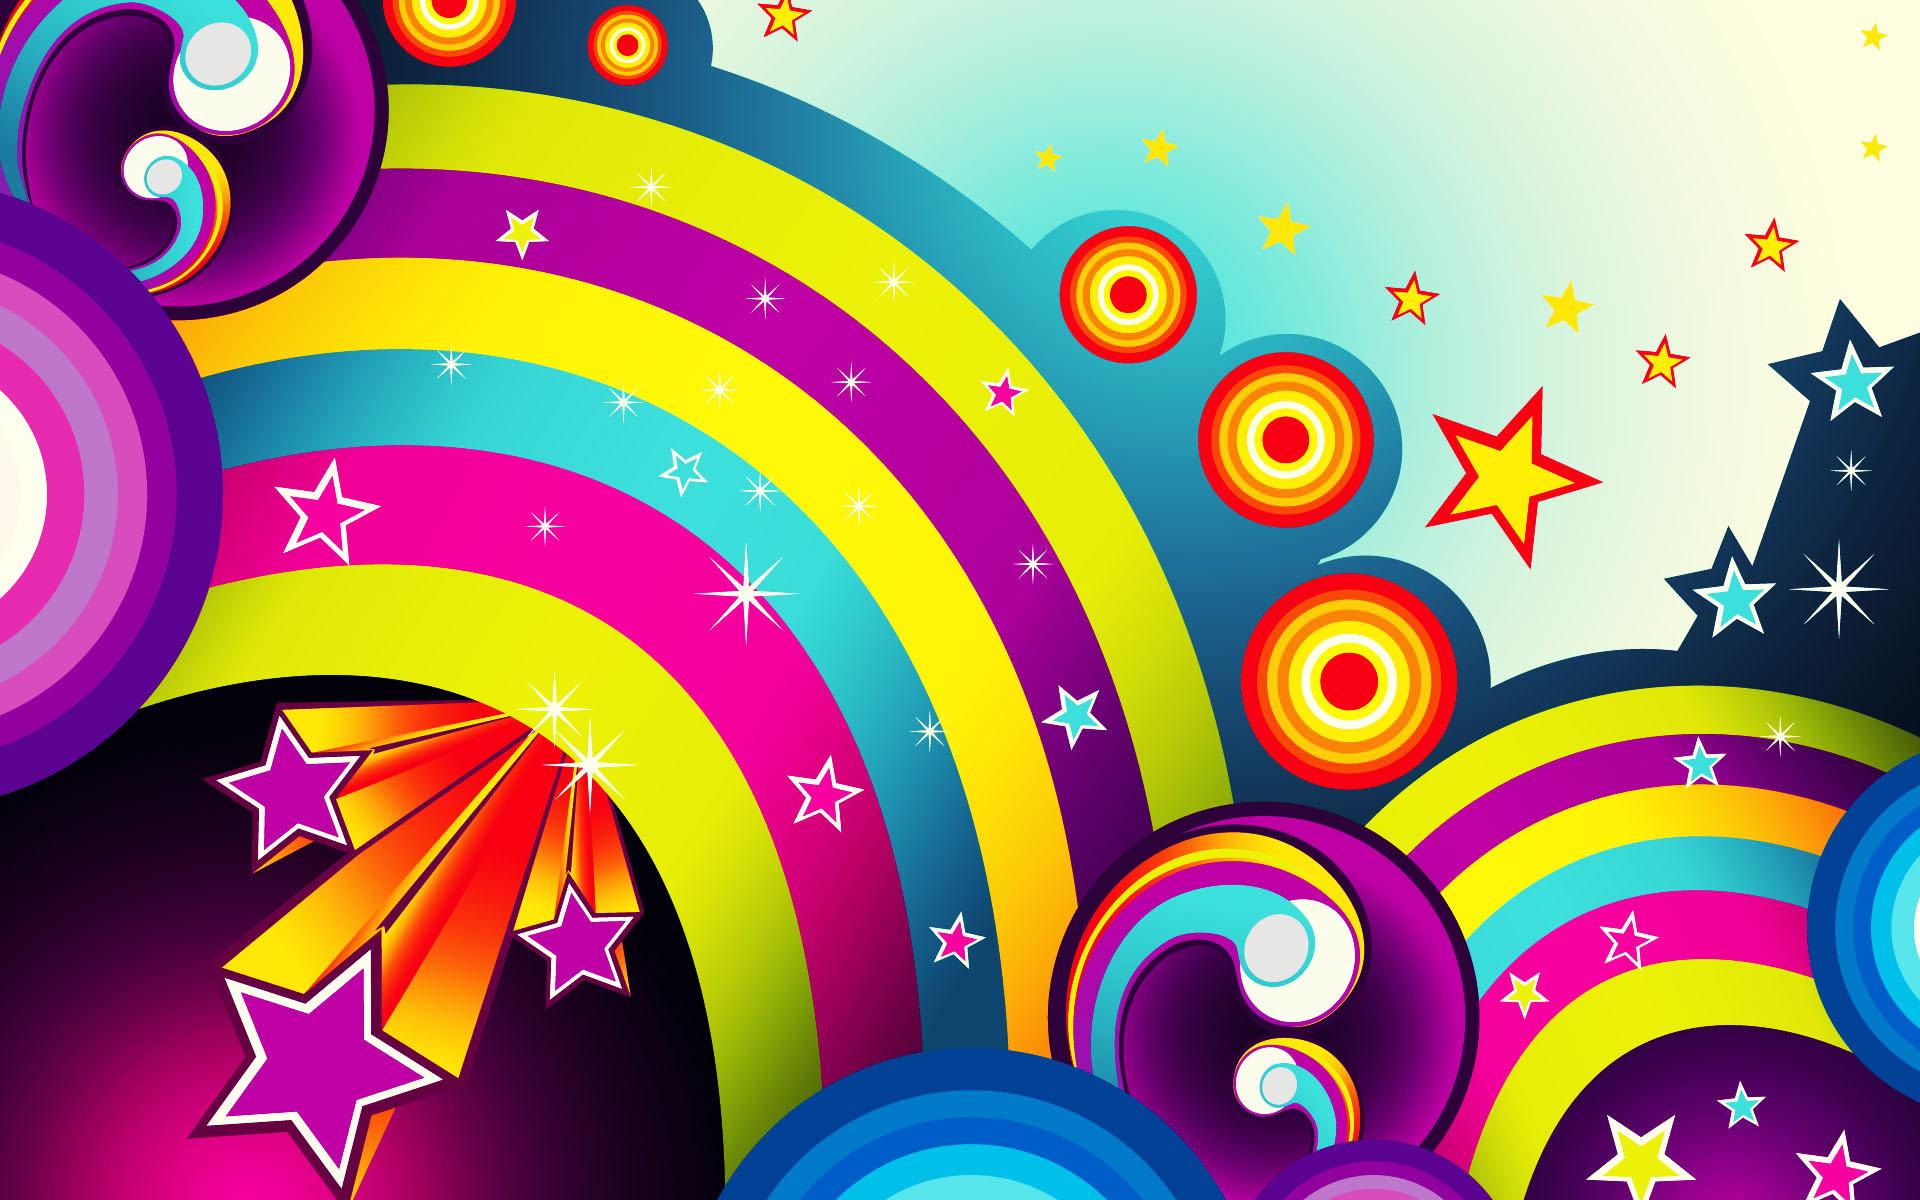 Free Fall Season Desktop Wallpapers Colorful Abstract Backgrounds Free Download Pixelstalk Net